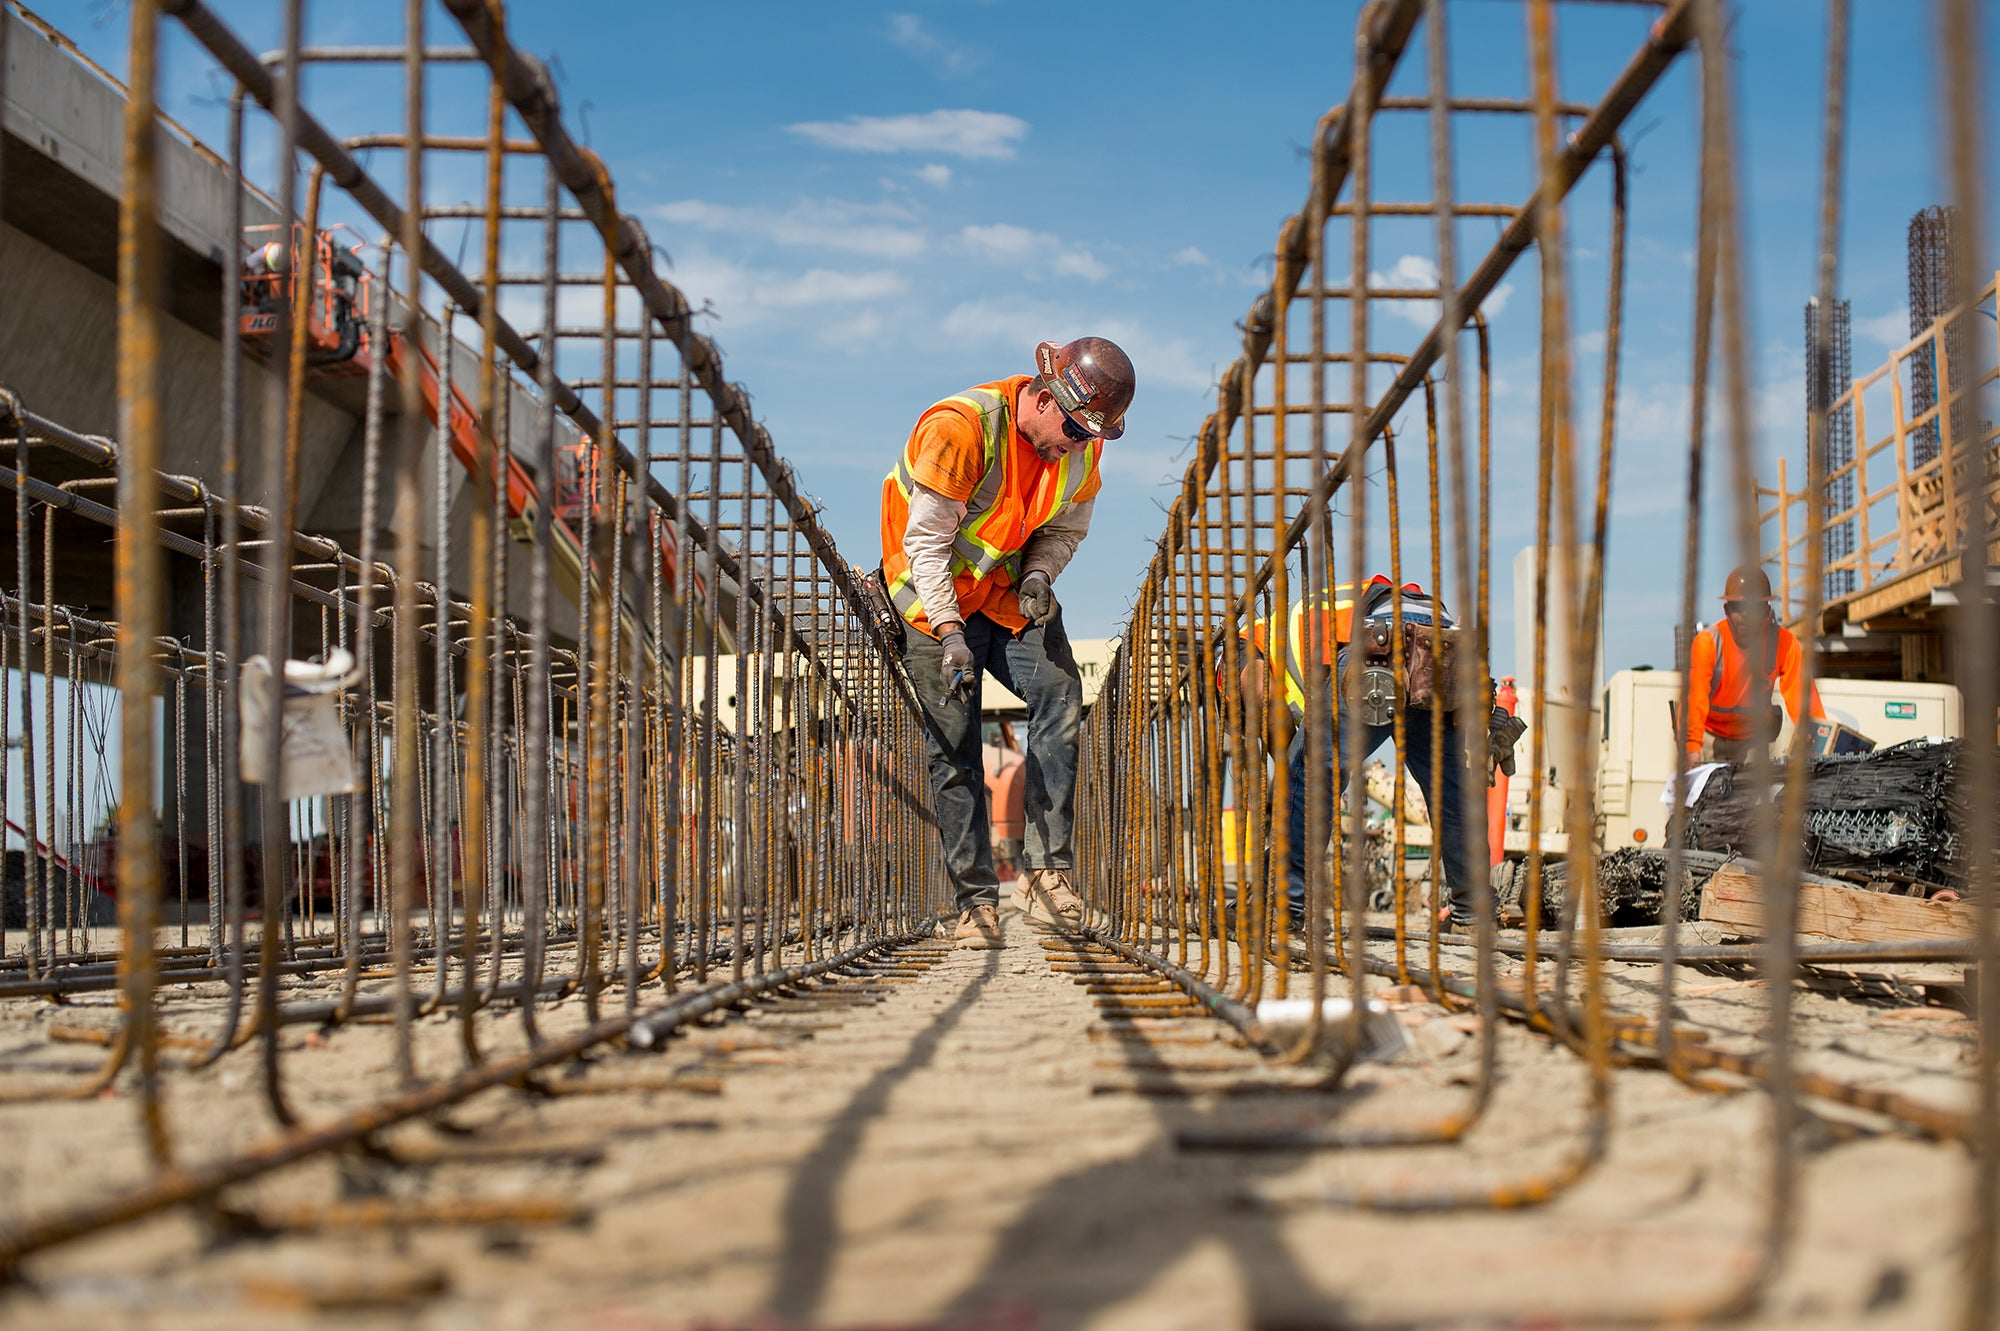 berryessa bart station worker bret fletcher reinforces rebar for parking structure rebar worker